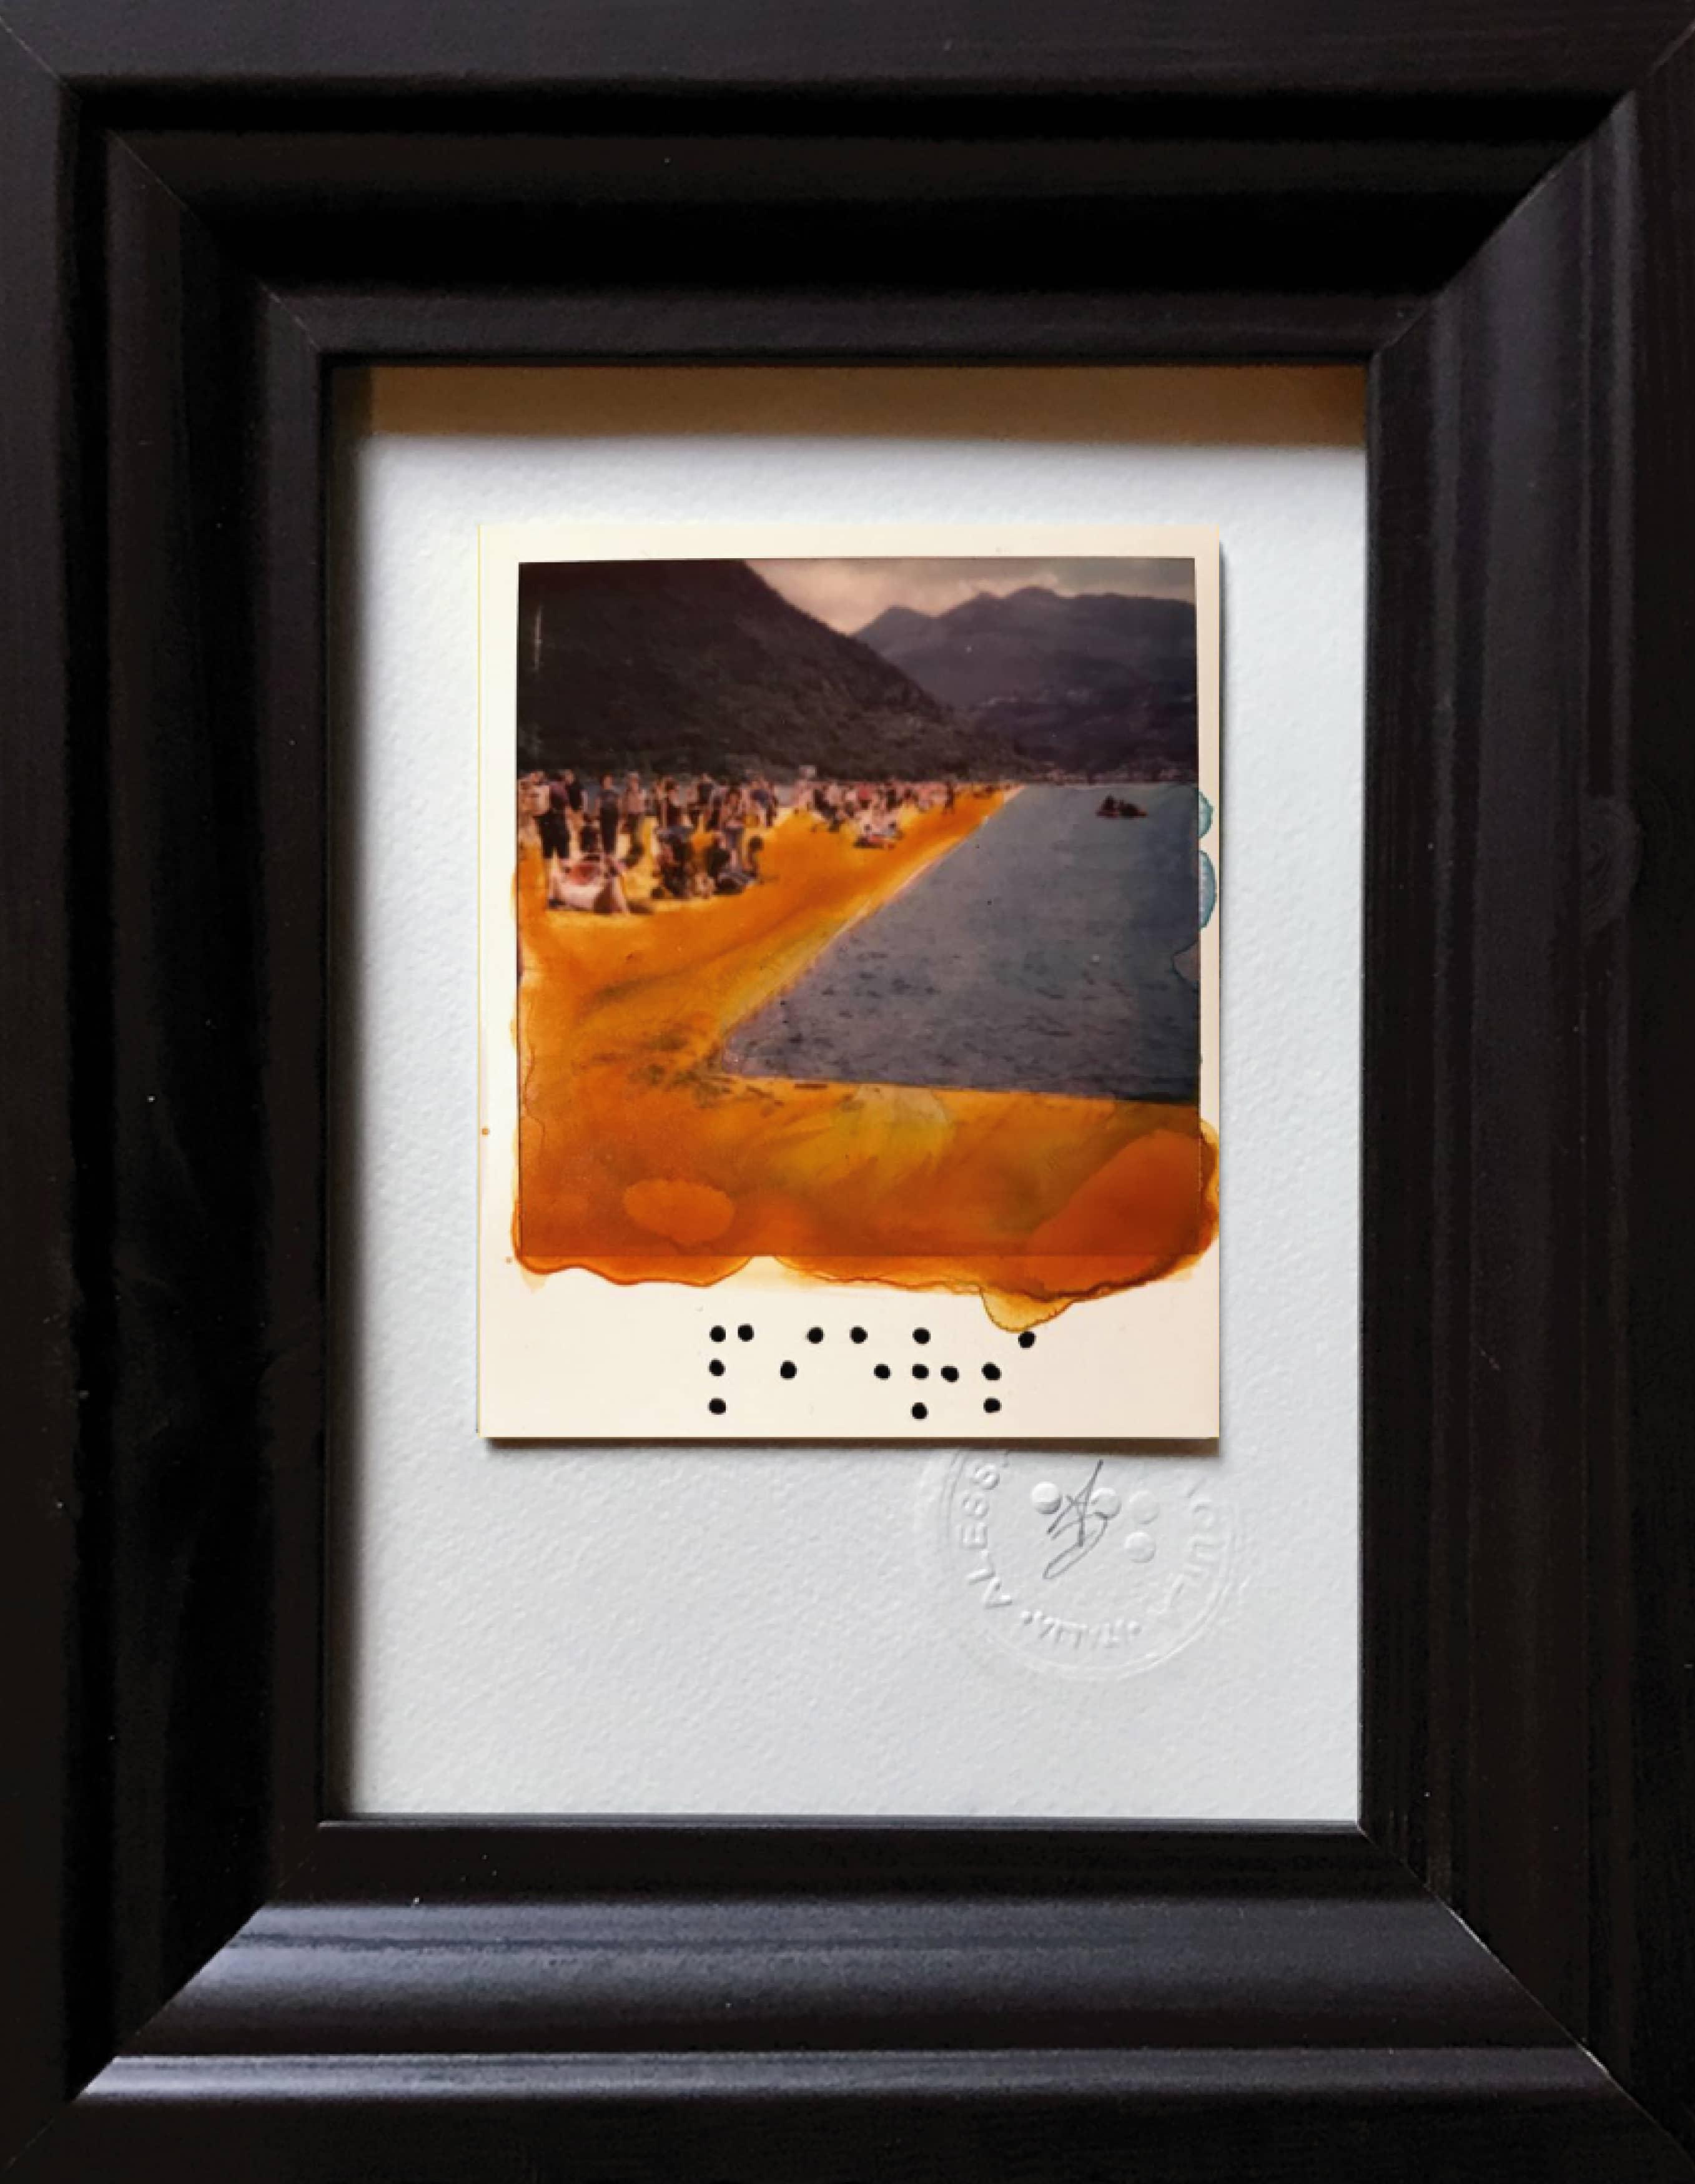 The Floating Polaroid #19